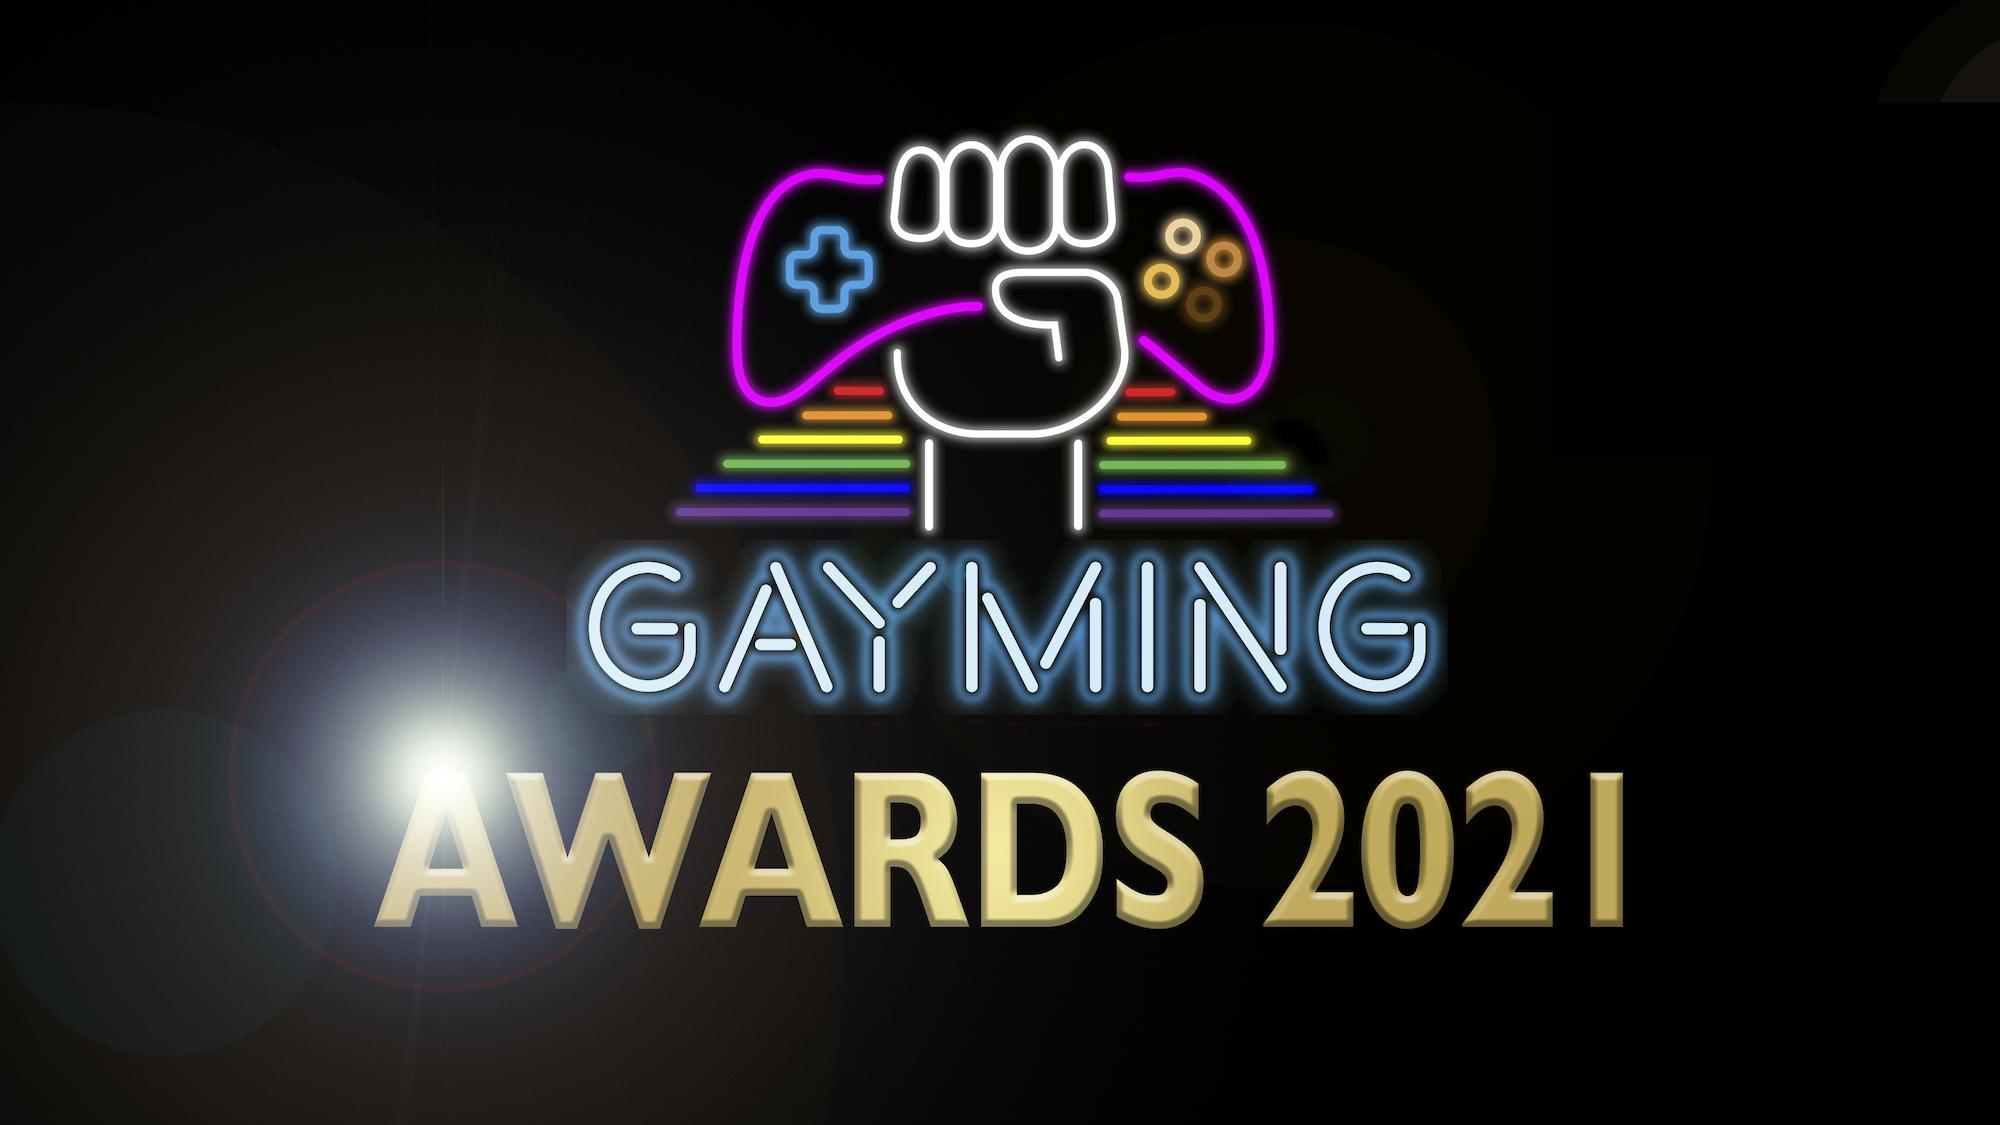 Gayming Awards 2021